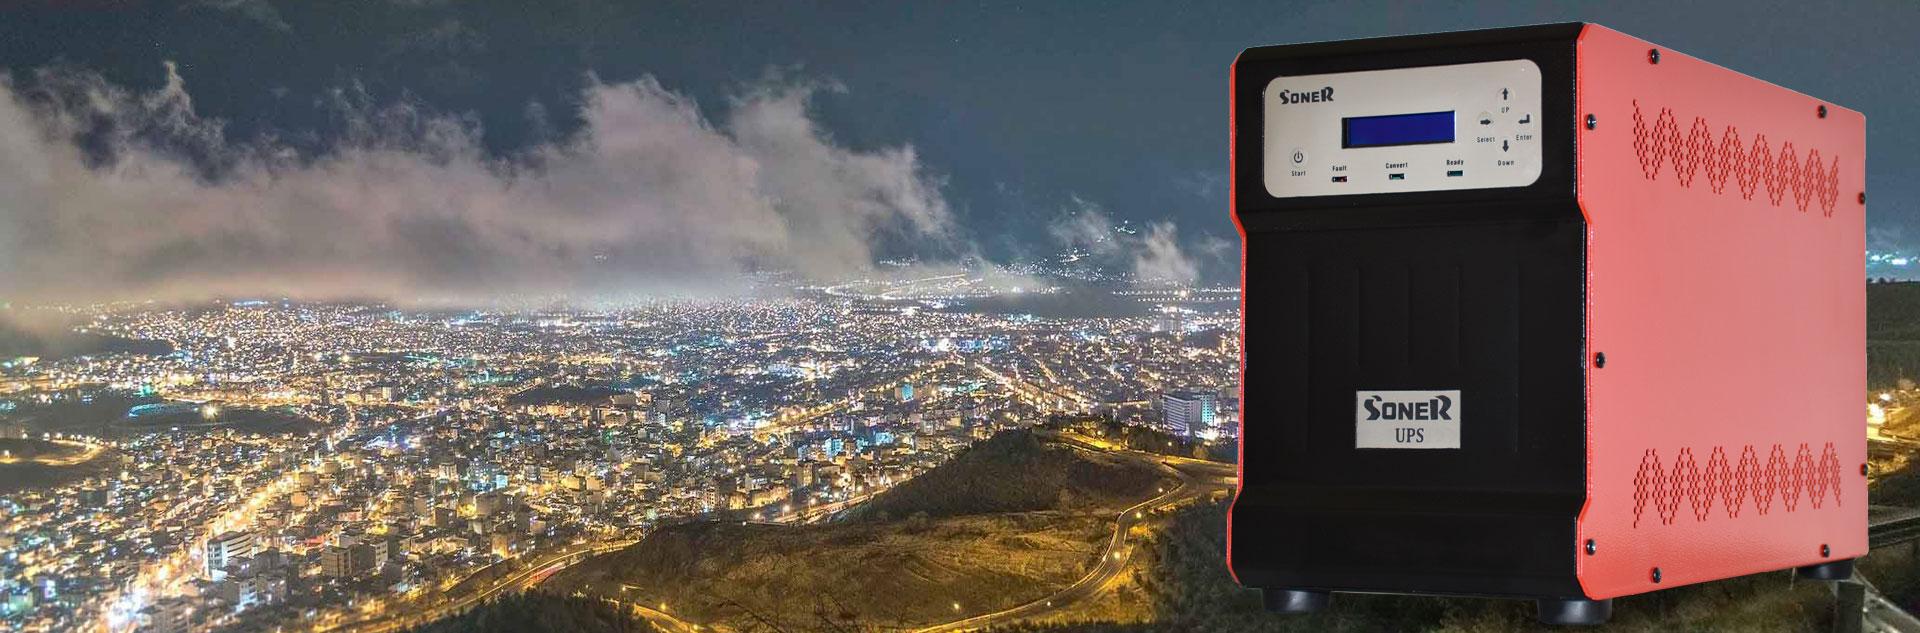 فروش دستگاه یو پی اس ایرانی سونر در سنندج